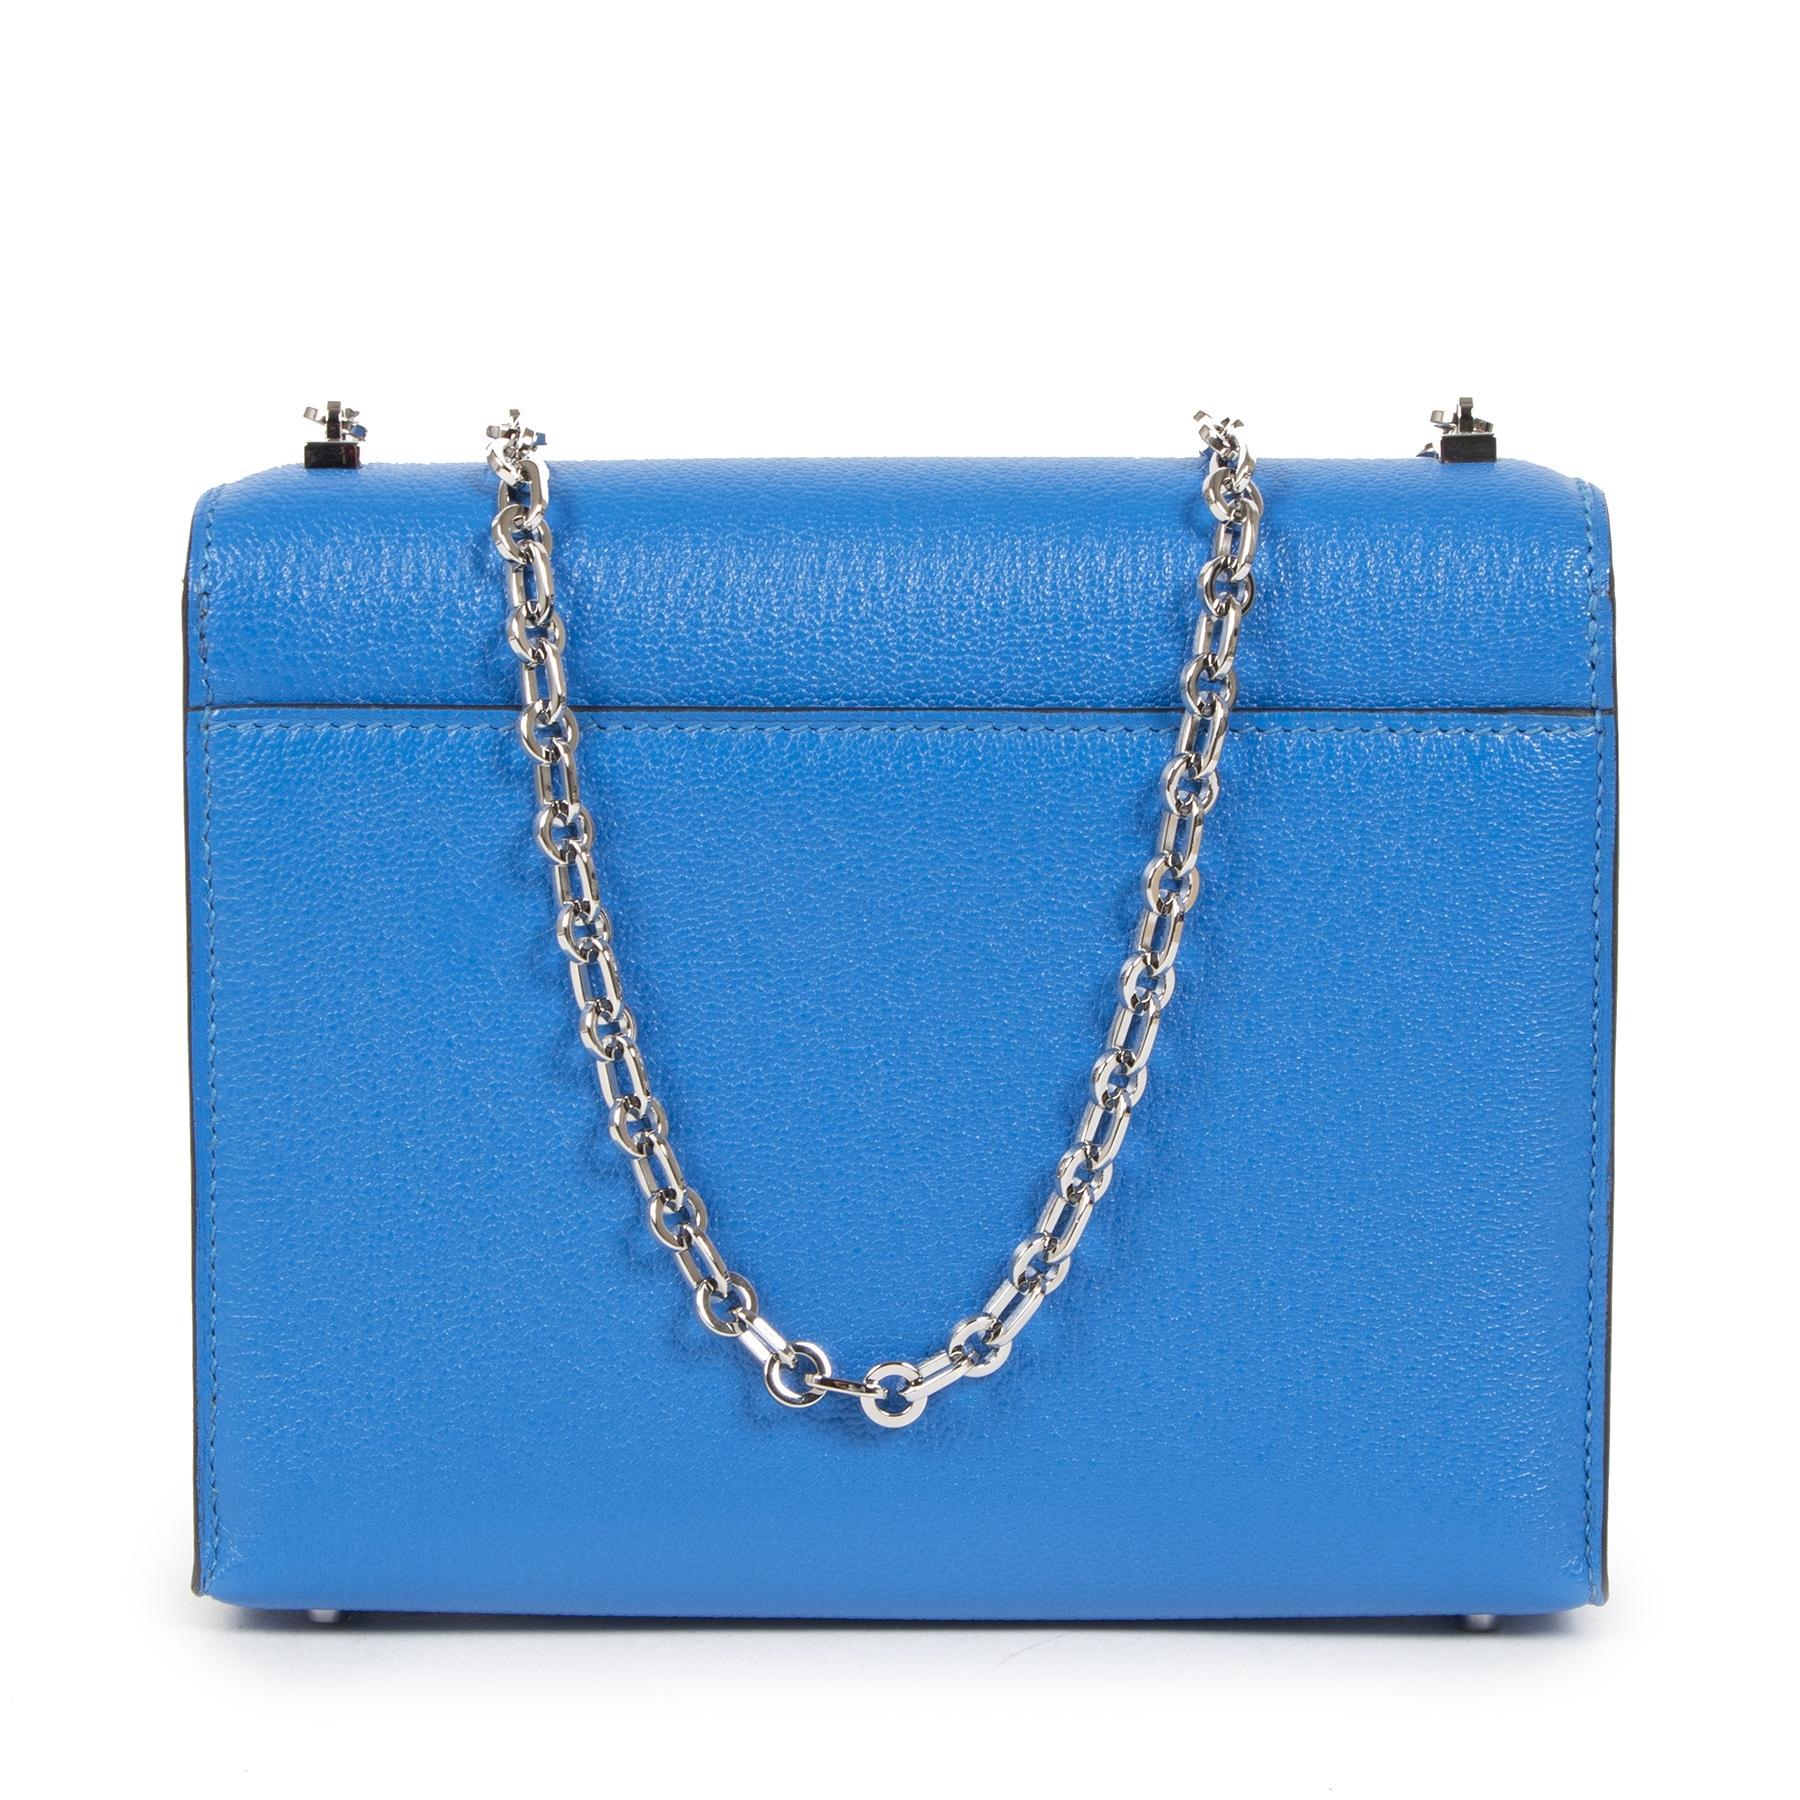 Authentieke Tweedehands Hermès Sac Verrou Chaine Mini Chevre Mysore 17 Bleu Hydra juiste prijs veilig online shoppen luxe merken webshop winkelen Antwerpen België mode fashion